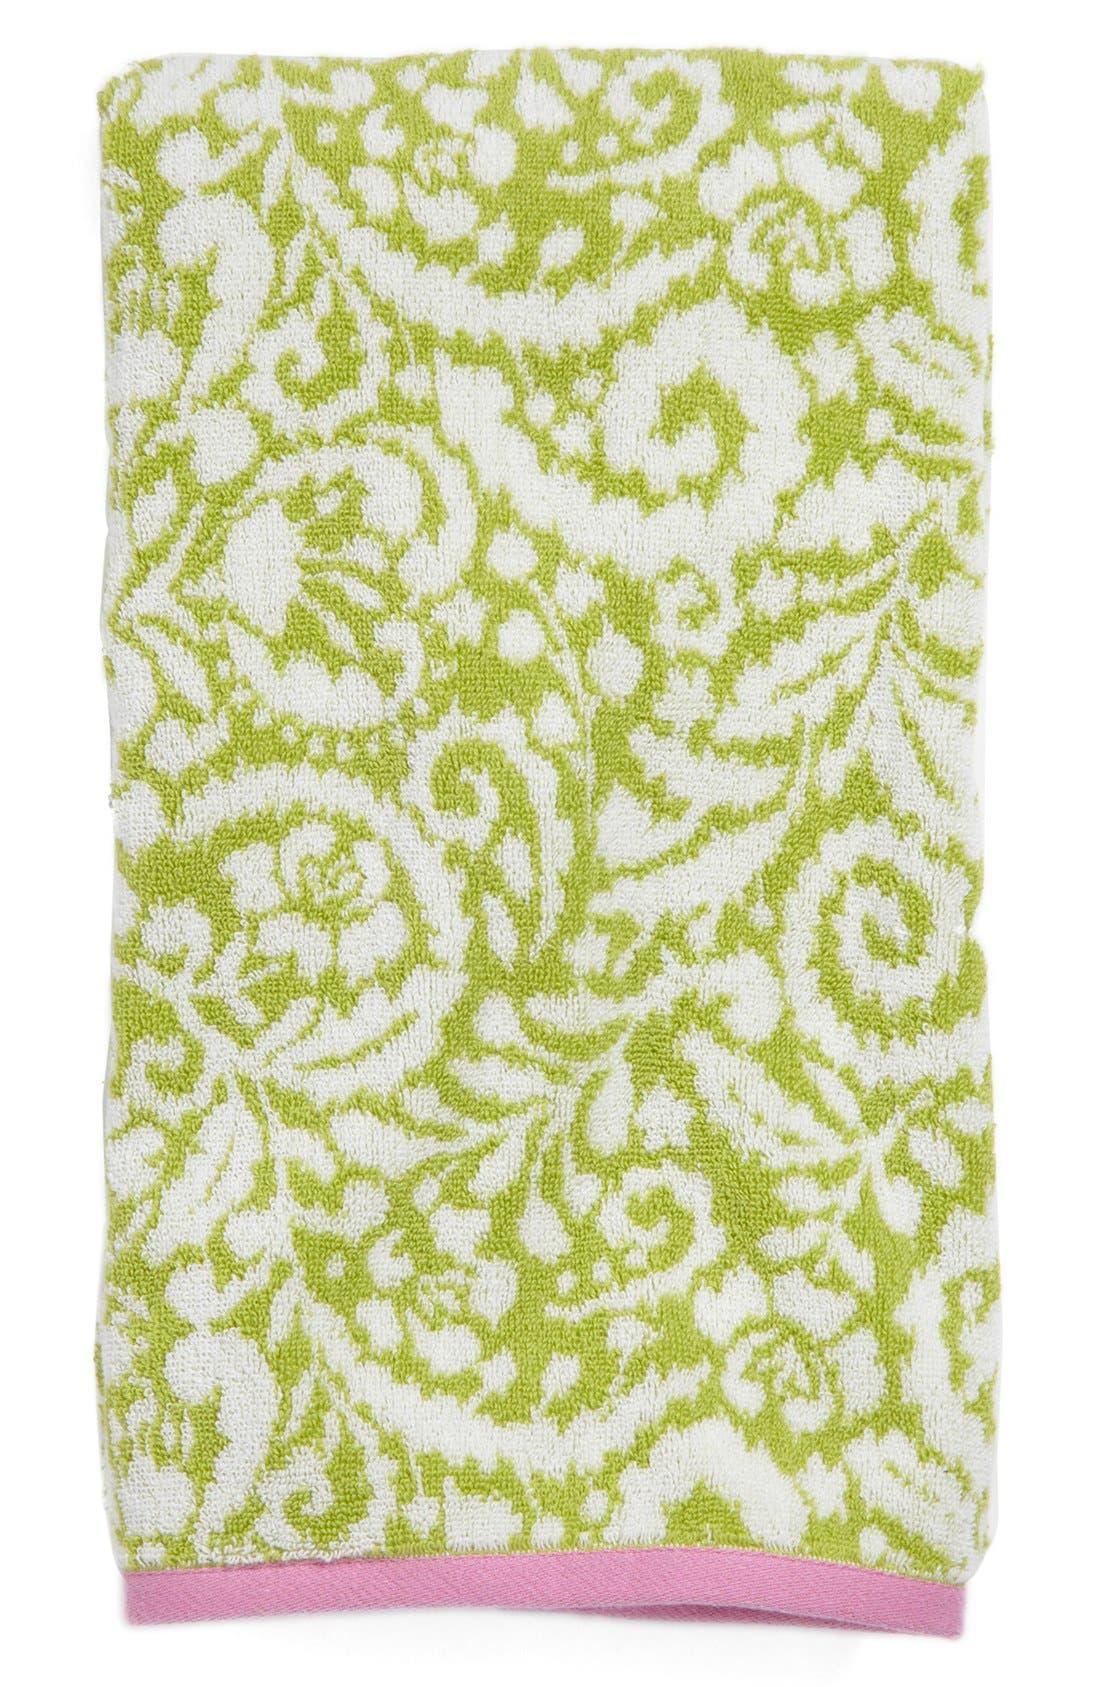 Main Image - Dena Home 'Ikat' Jacquard Bath Towel